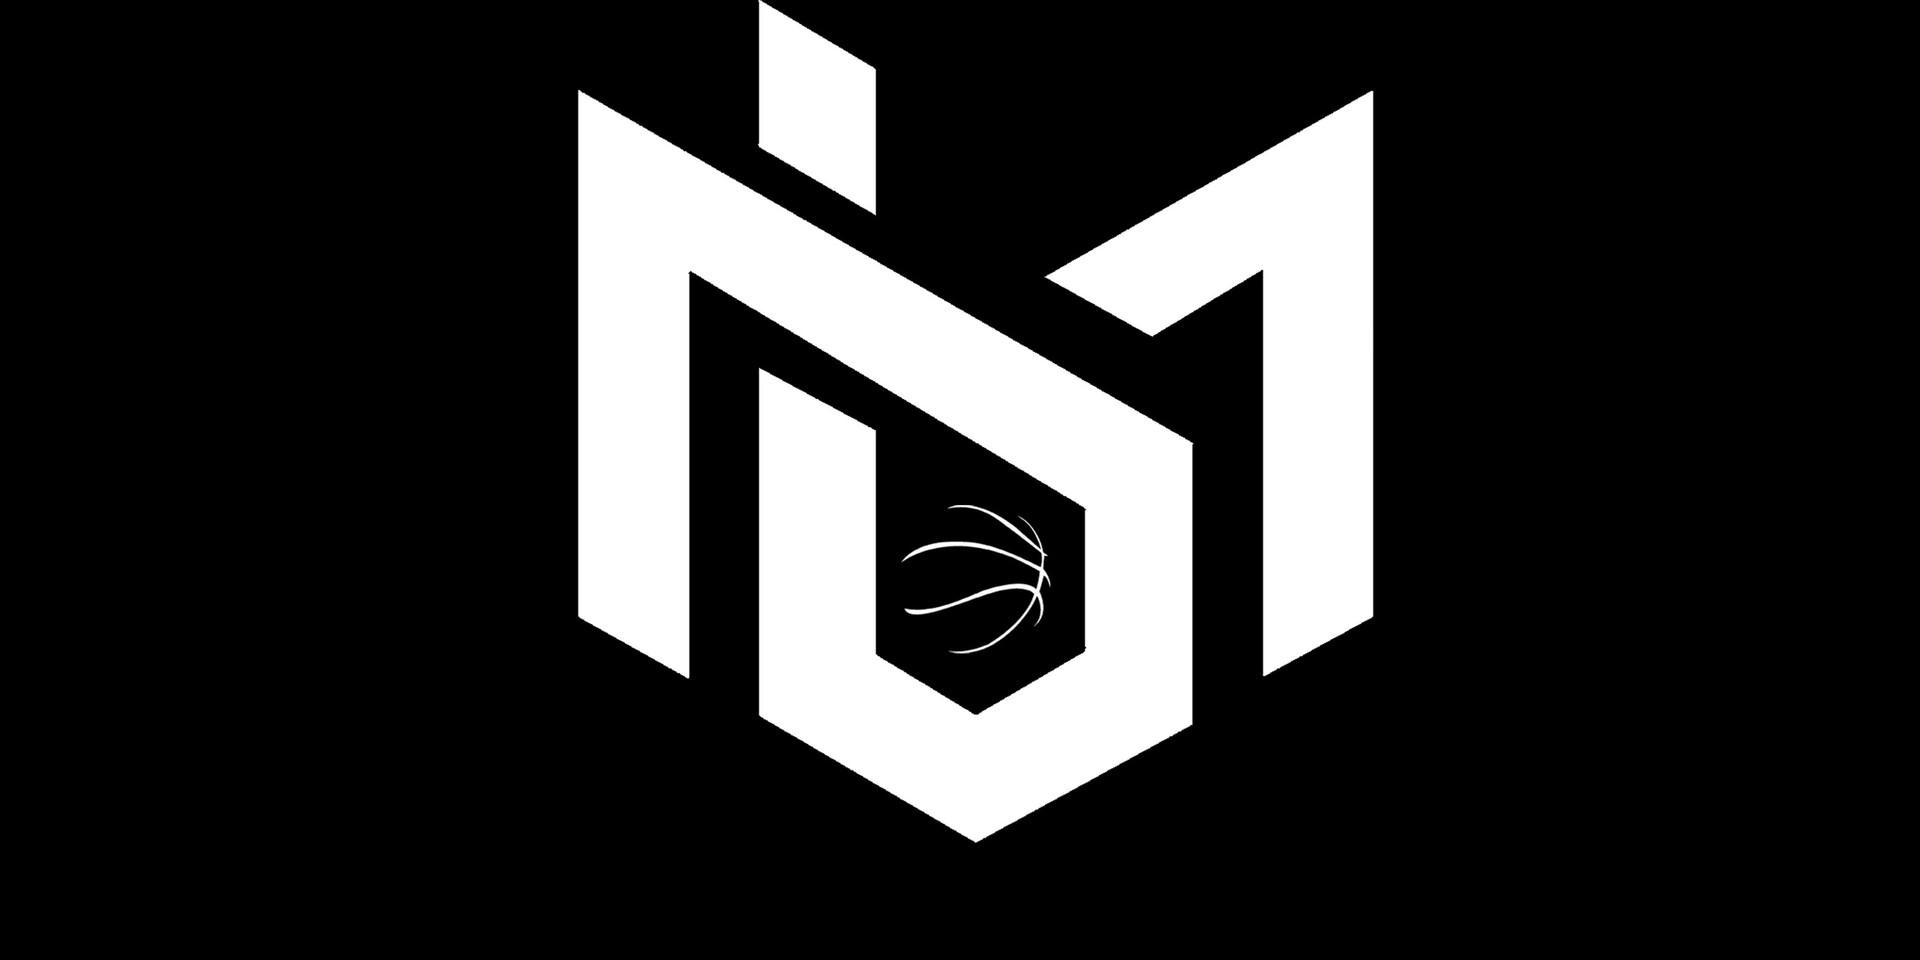 MB logo 1.JPG